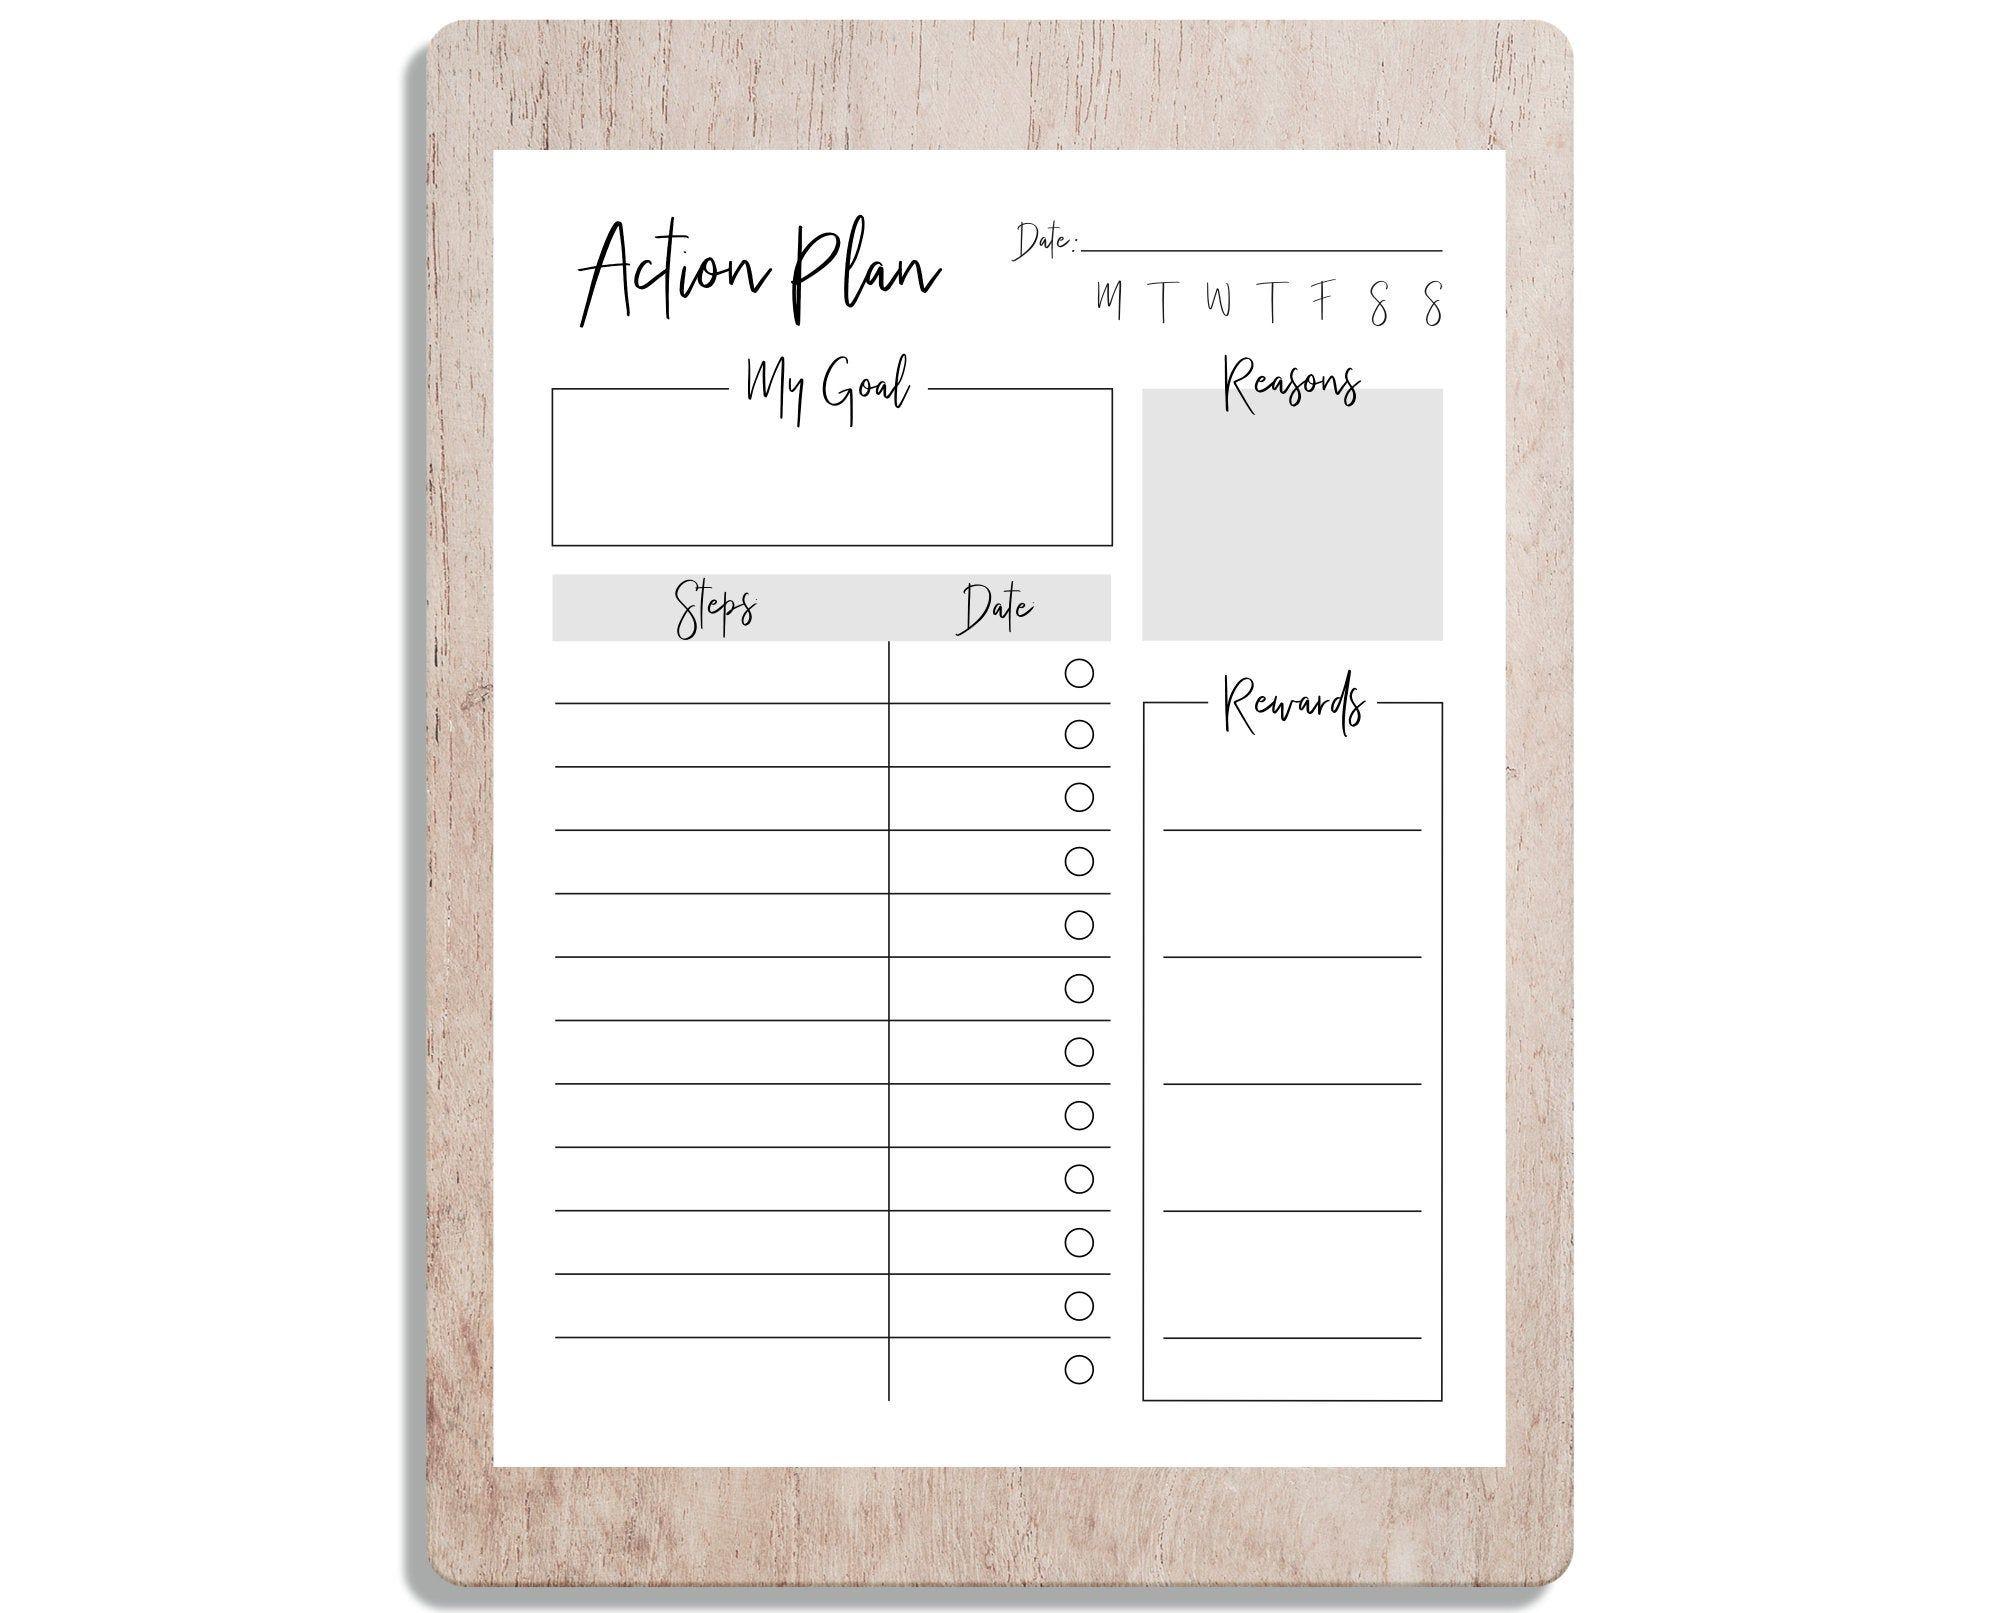 Printable Goal Action Plan Goal PDF, 2020 Goals, Goals